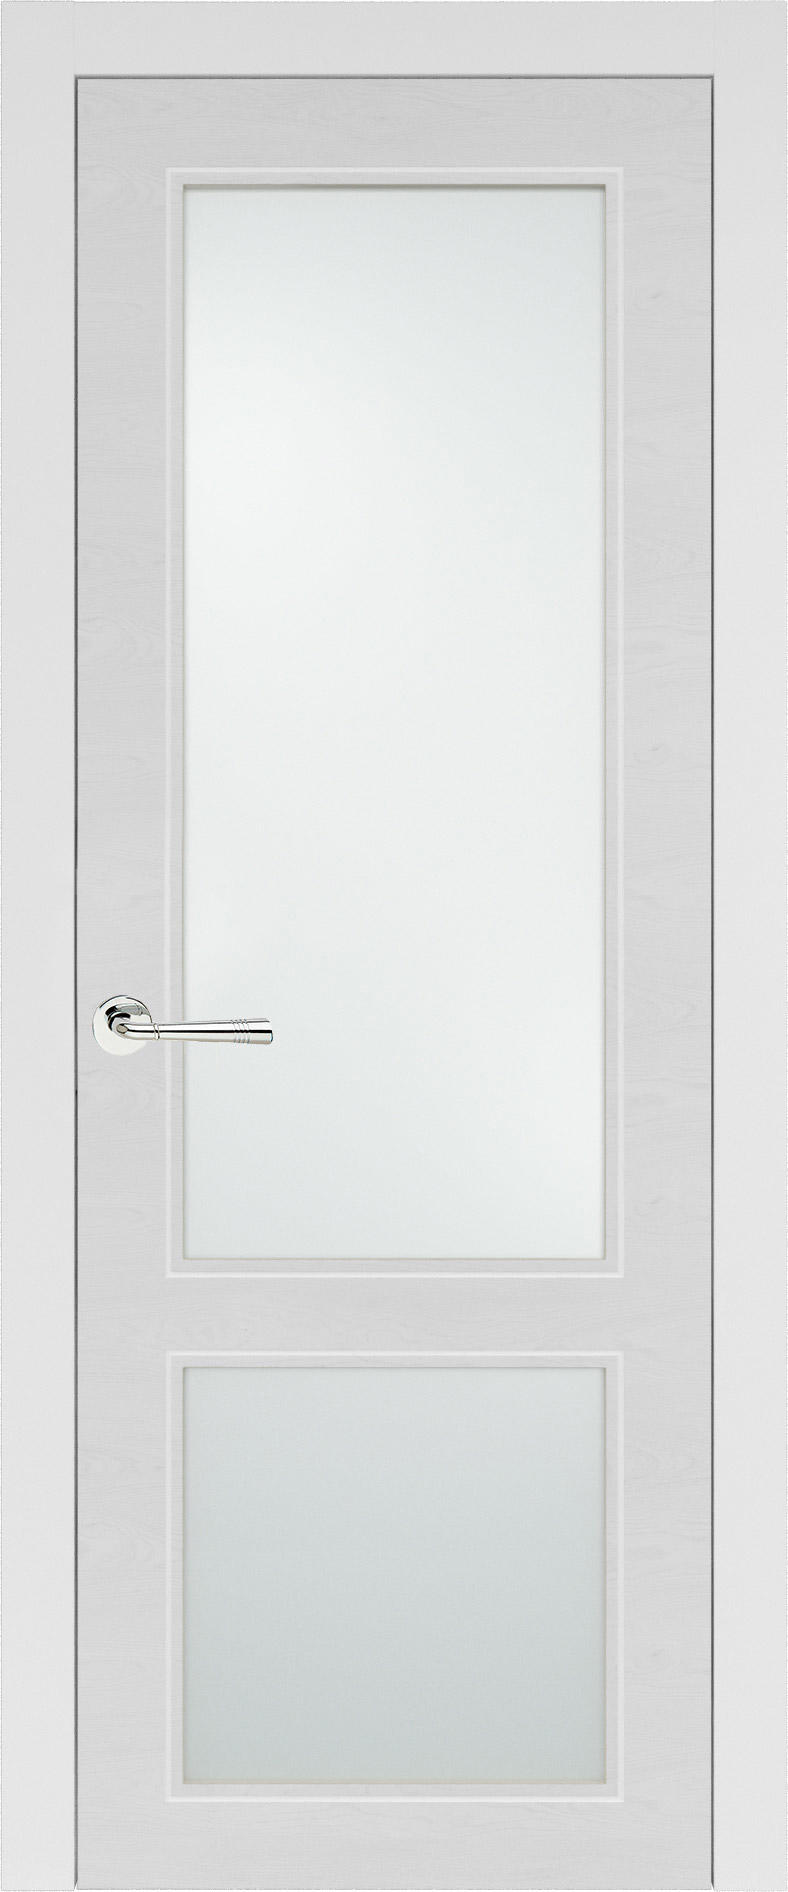 Dinastia Neo Classic цвет - Белая эмаль по шпону (RAL 9003) Со стеклом (ДО)